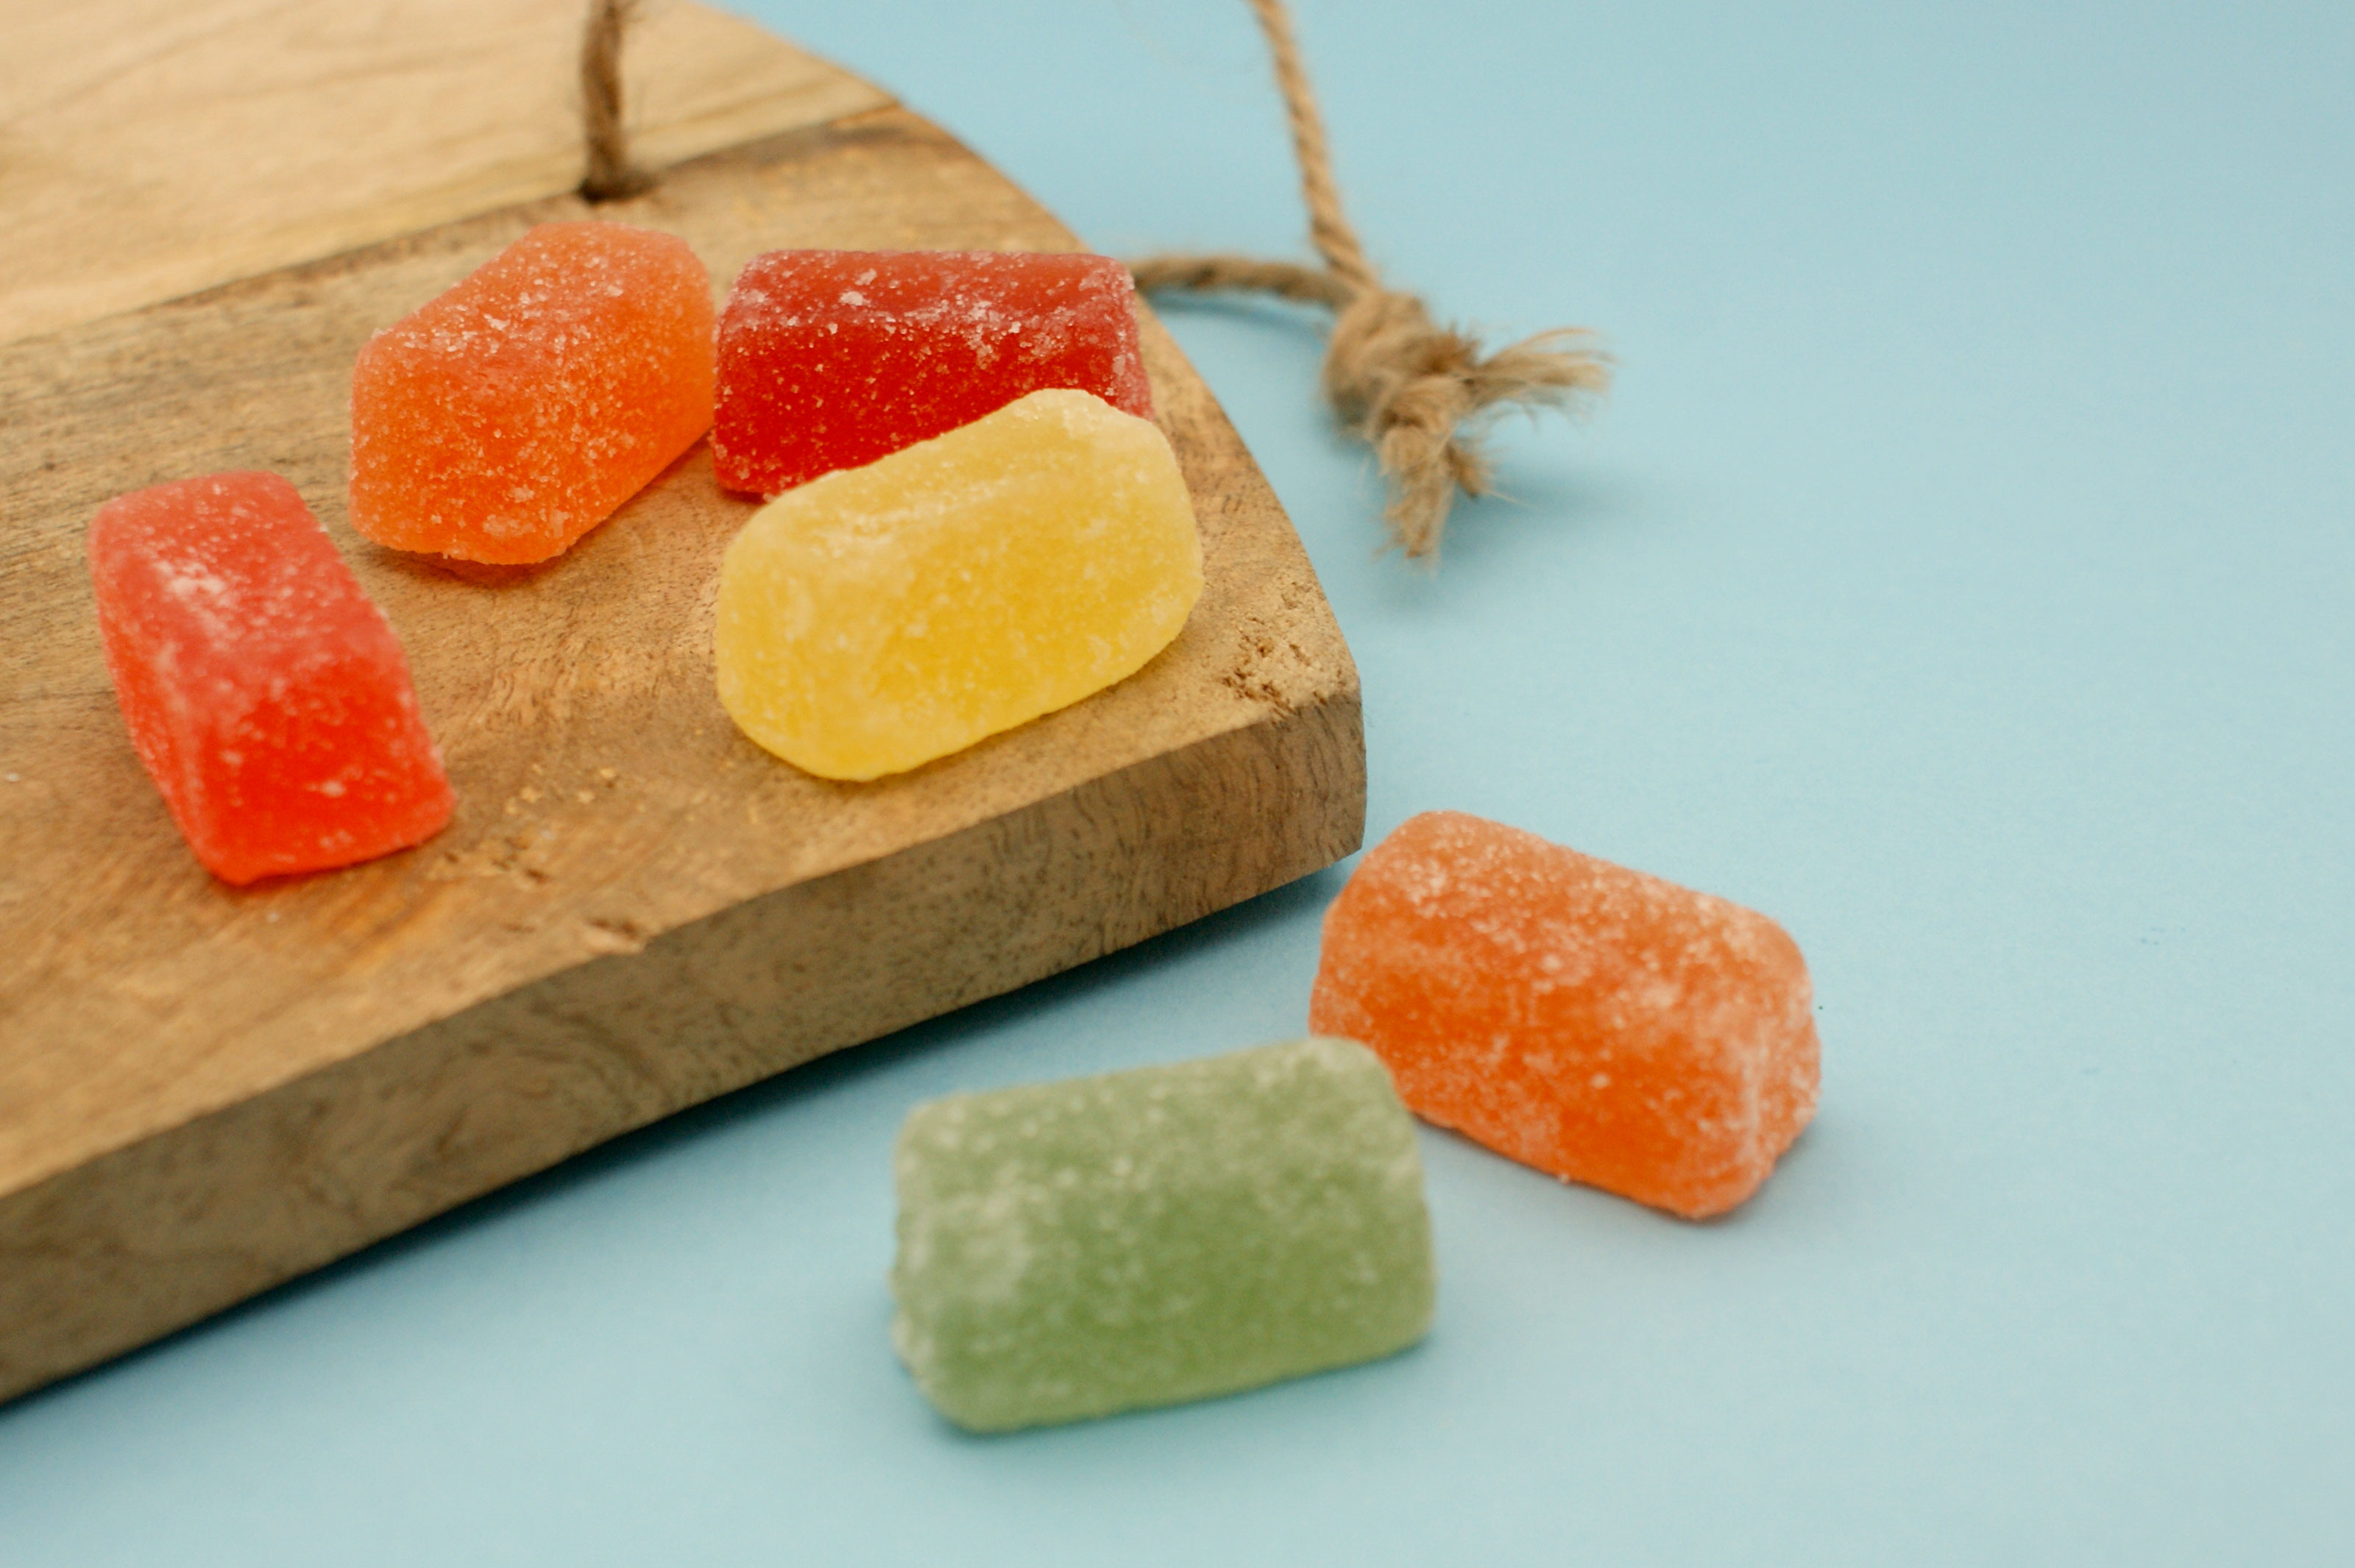 Jelly vegano sin azúcar, sin gluten y con estevia